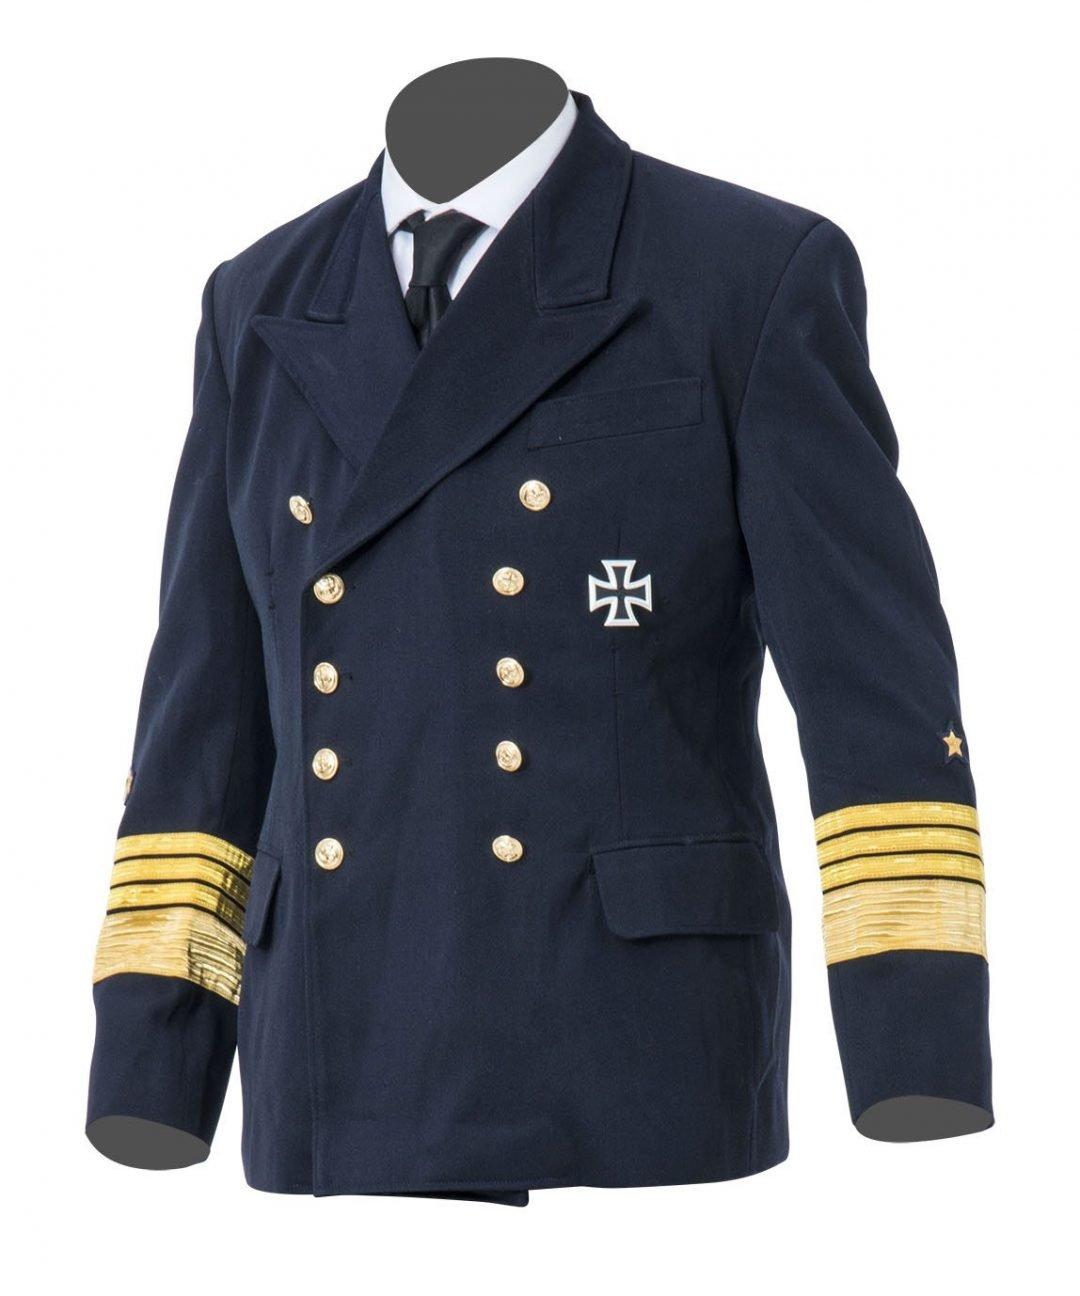 WW2 German Kriegsmarine Admirals tunic